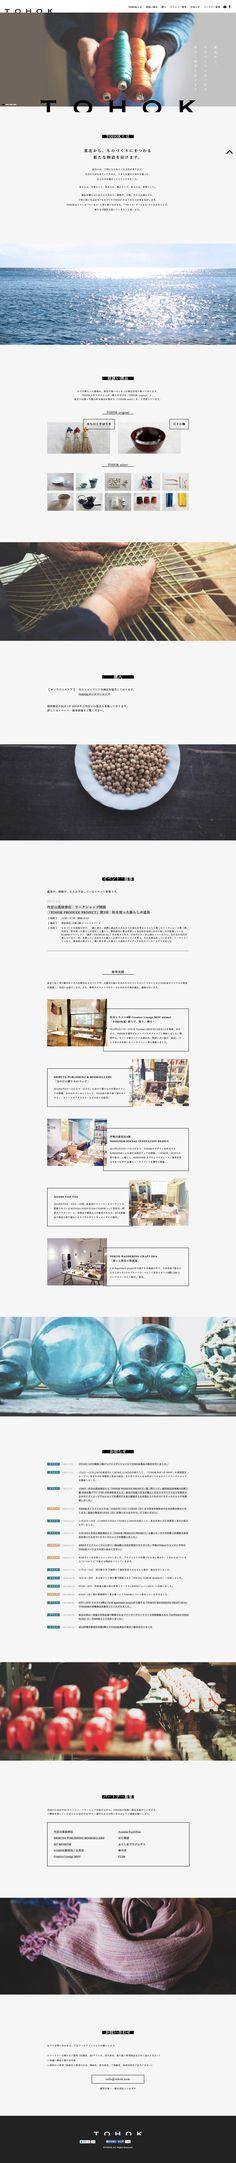 #web #webdesign #design #layout #grid